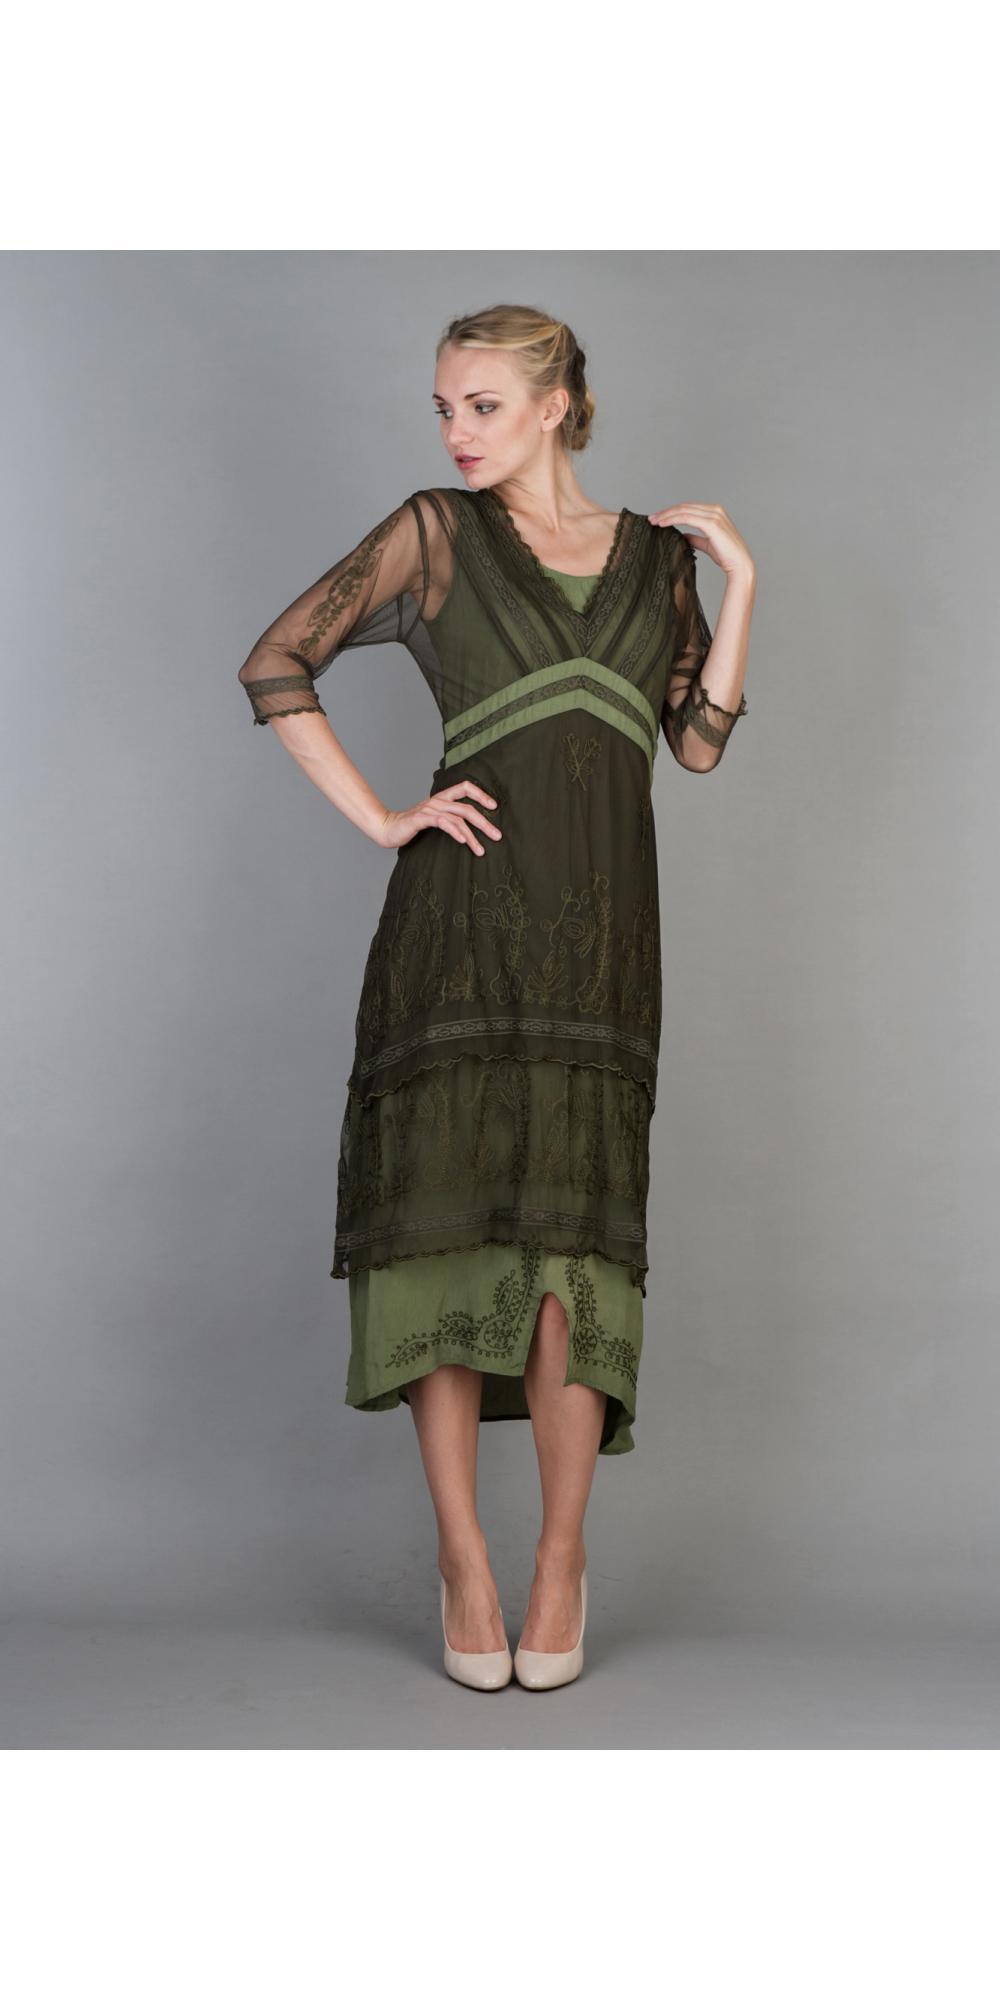 Fullsize Of Tea Party Dresses